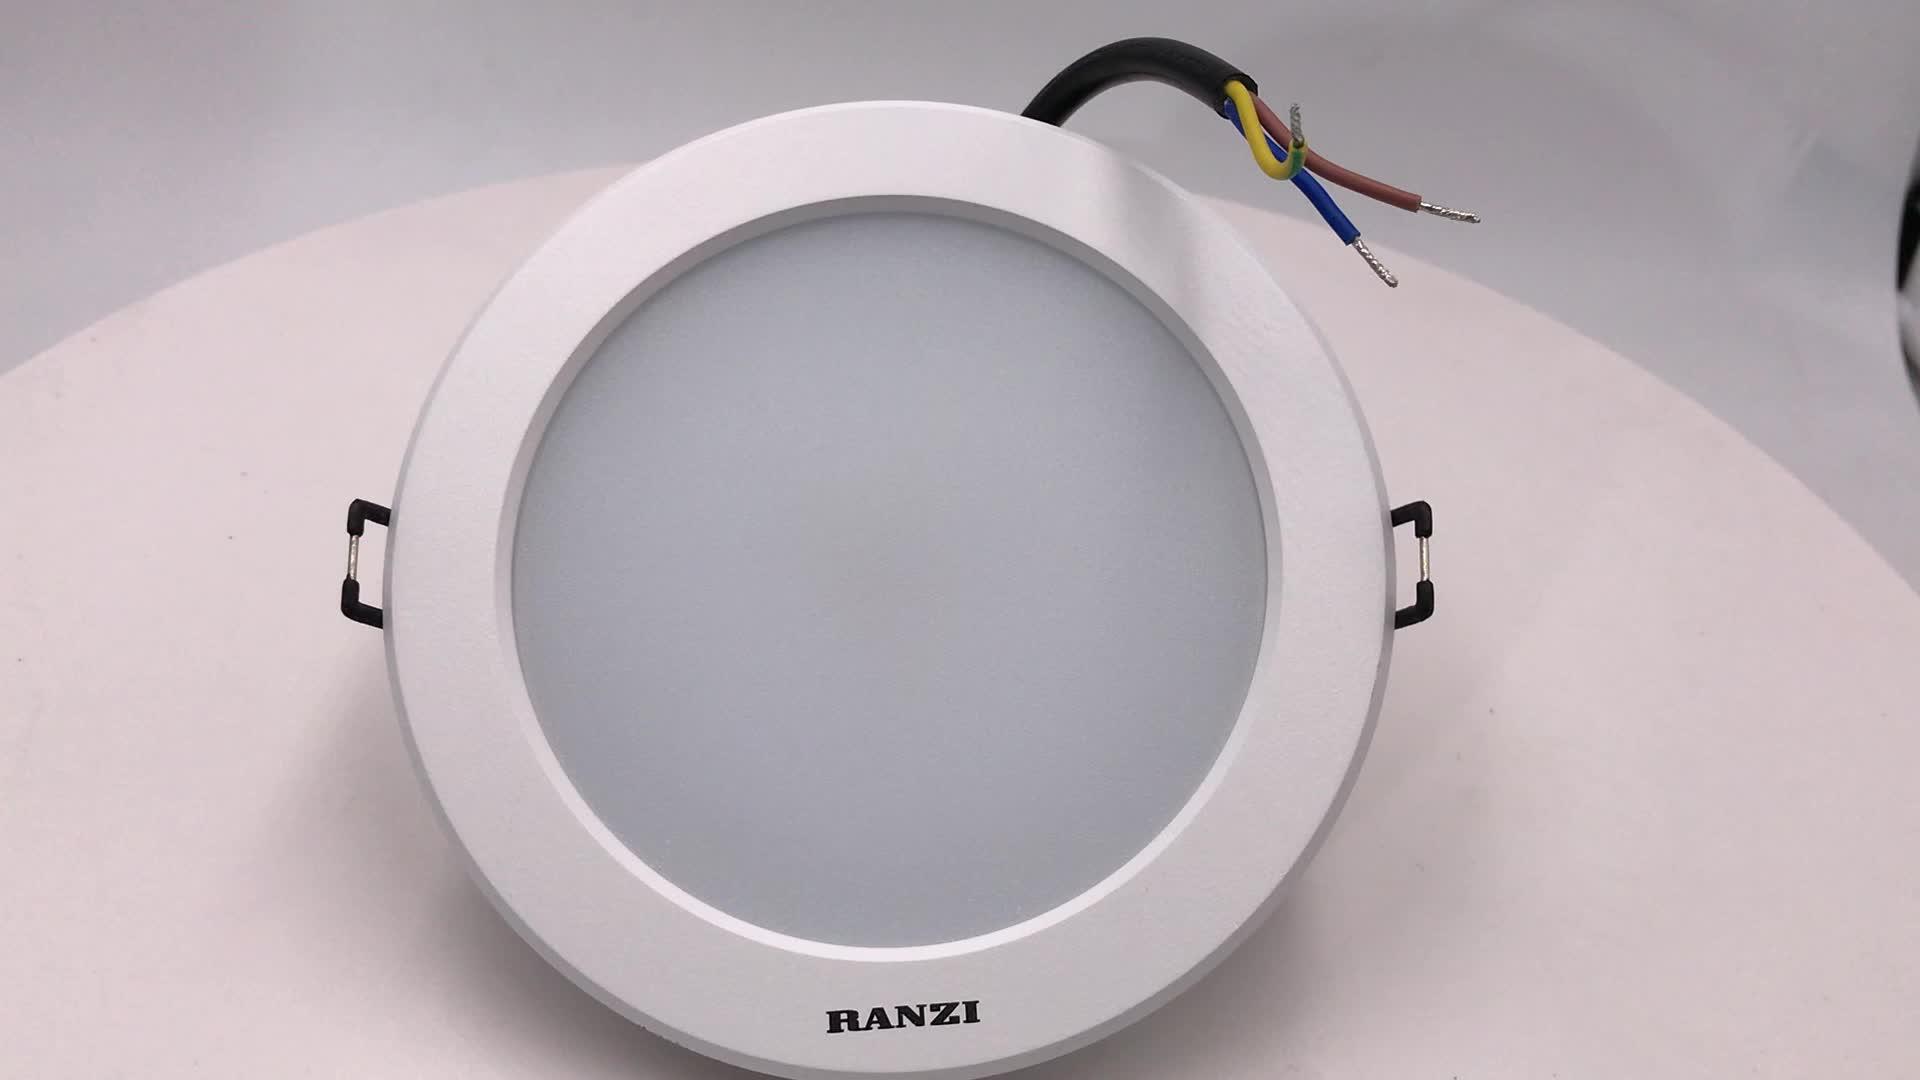 Düşük fiyat 5W 7W 9W 12W 15W 20W 30W gömme downlight difüzör PC + alüminyum gövde LED aşağı ışık